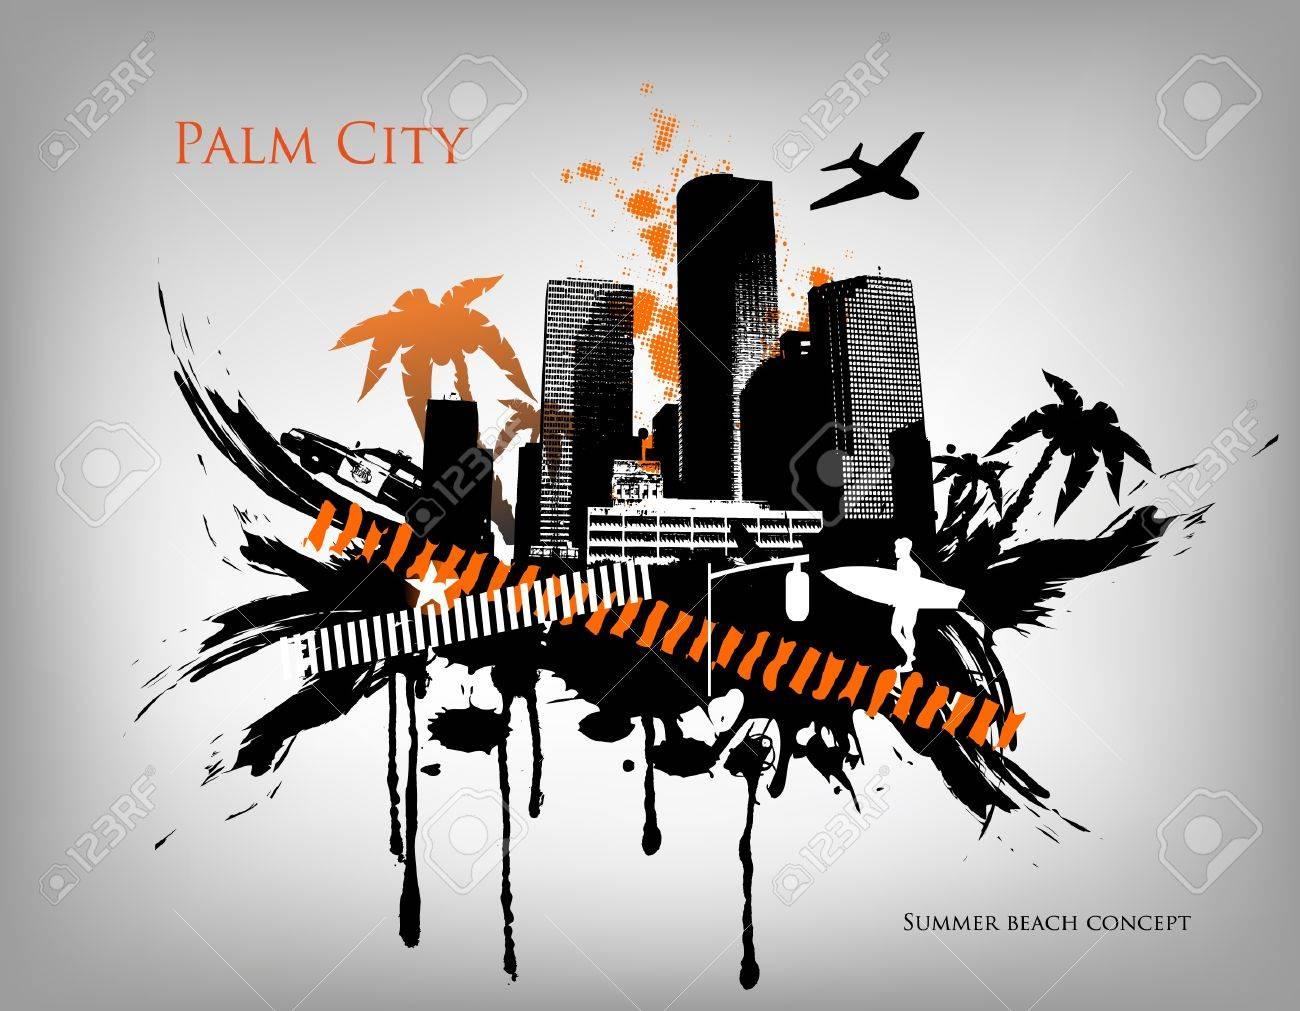 Summer Palm City Vector Illustration Stock Vector - 14127057